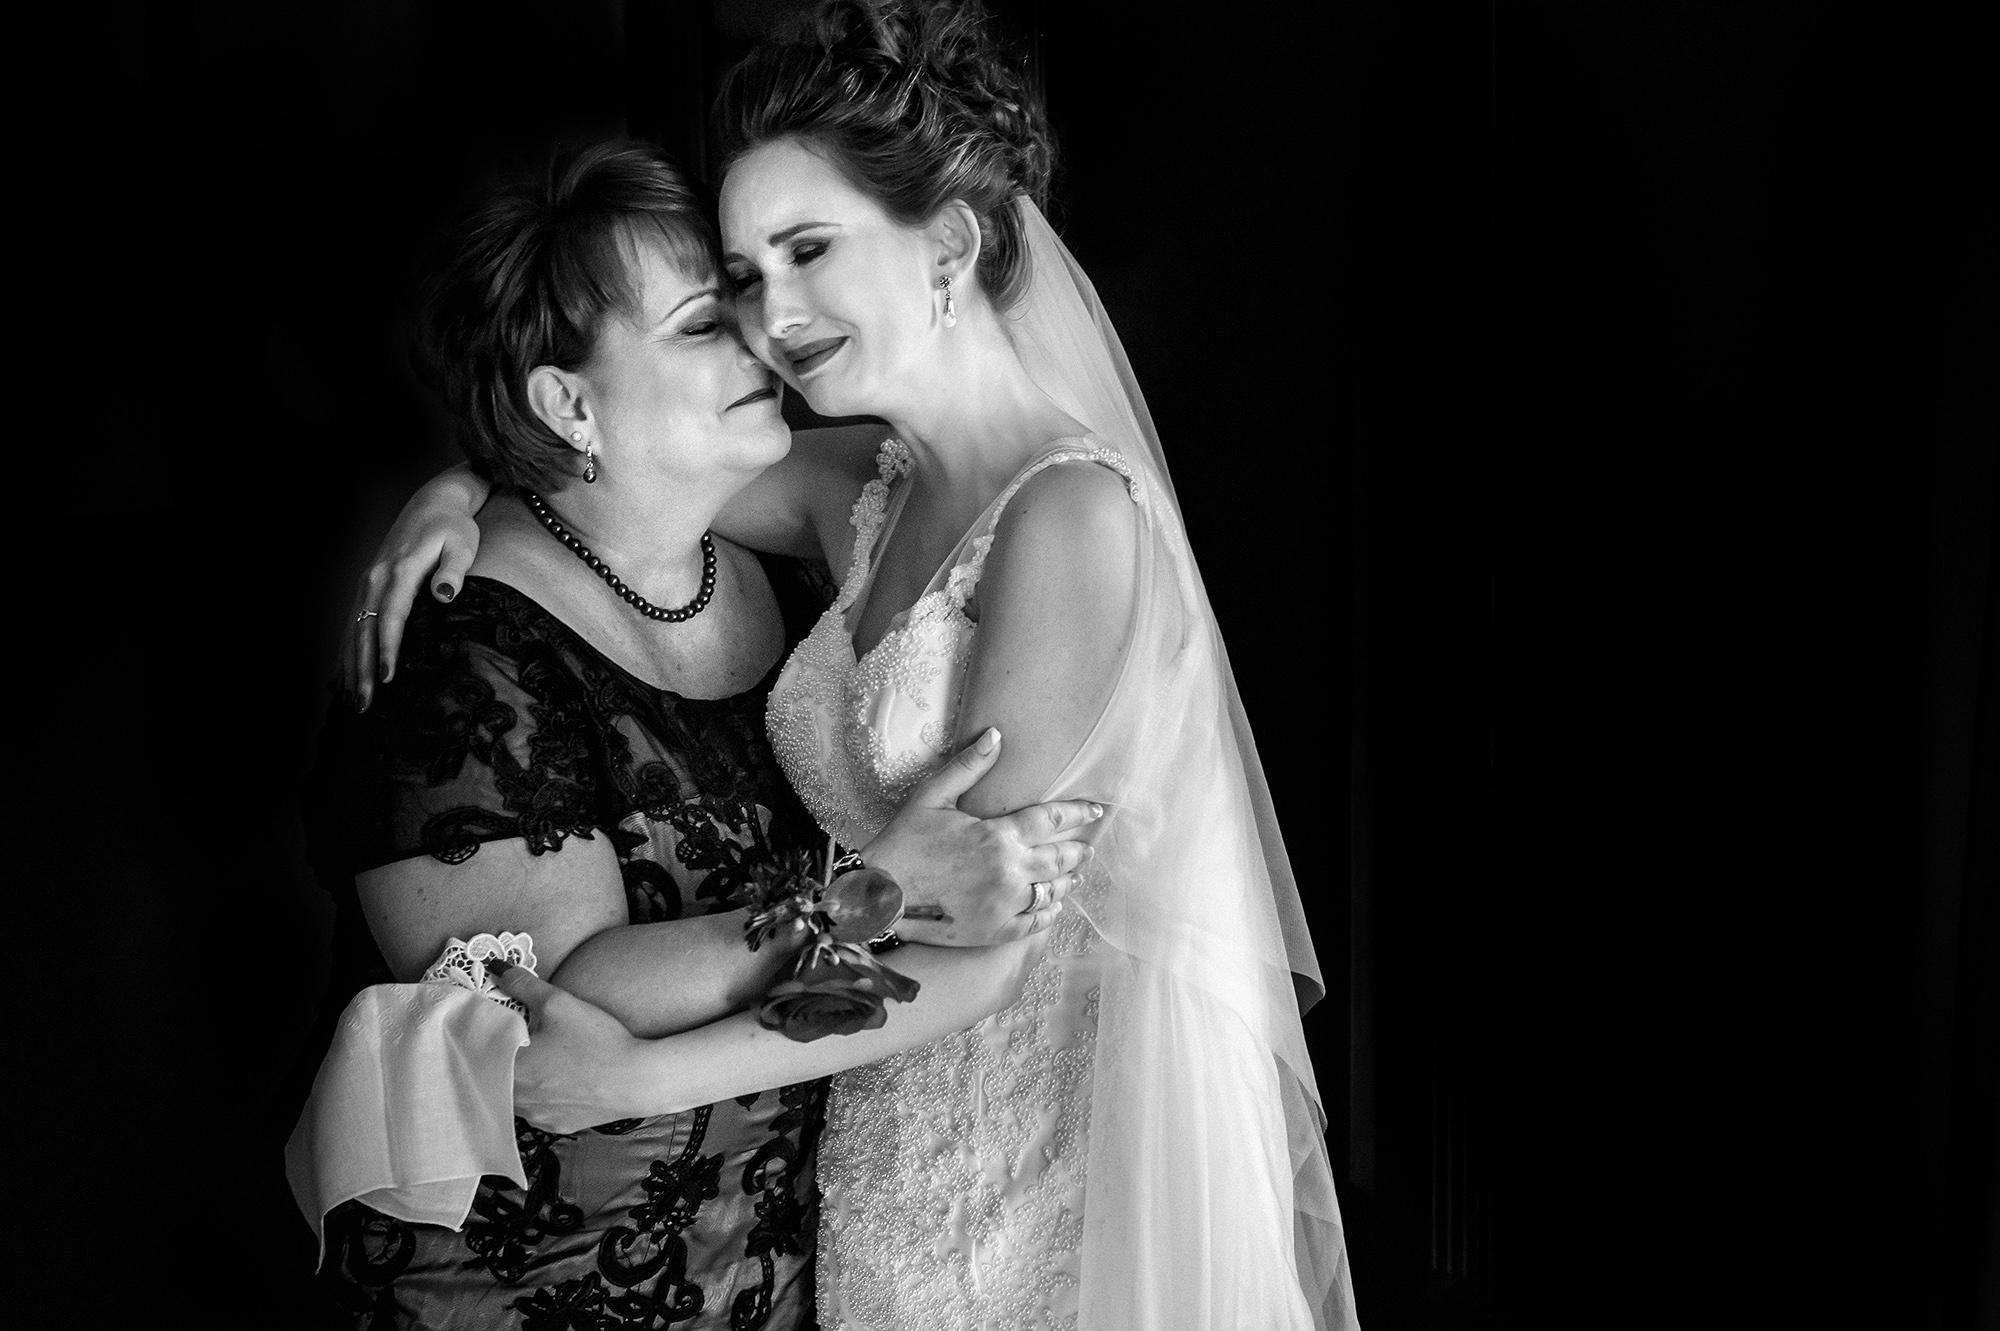 Bride and mom in emotional embrace - Davina + Daniel